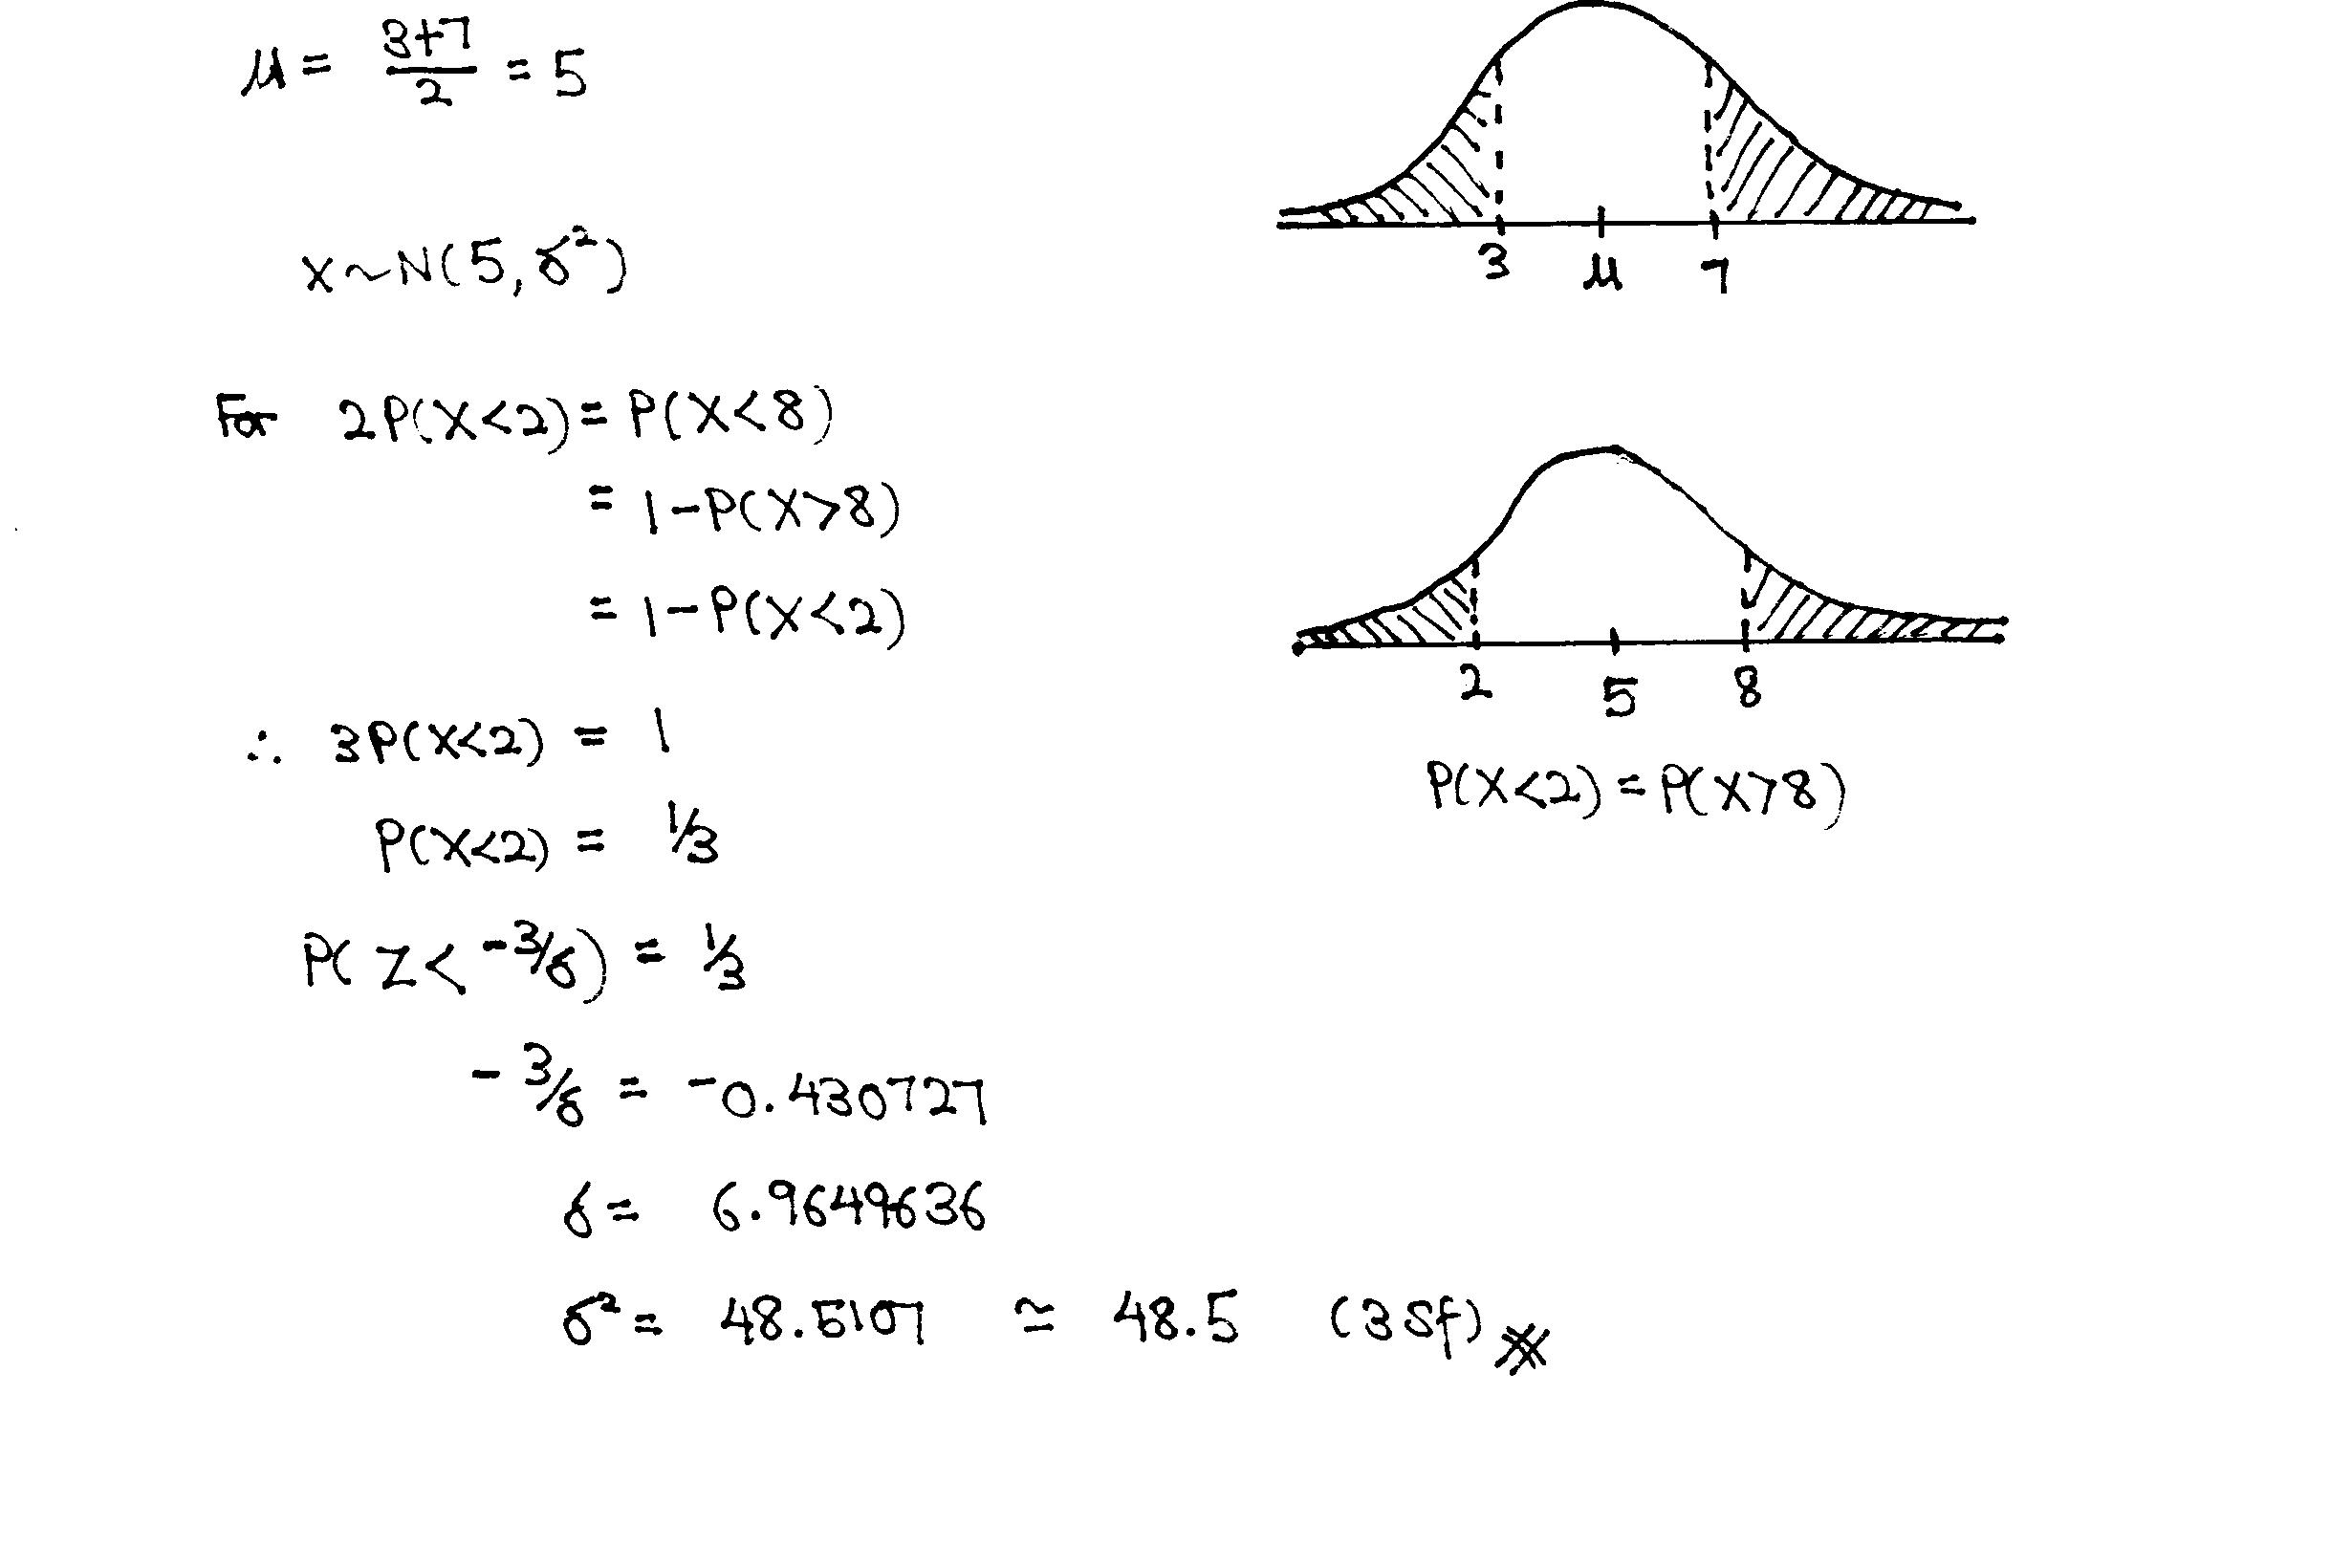 Nyjc Normal Distribution Tutorial Q7 Solution